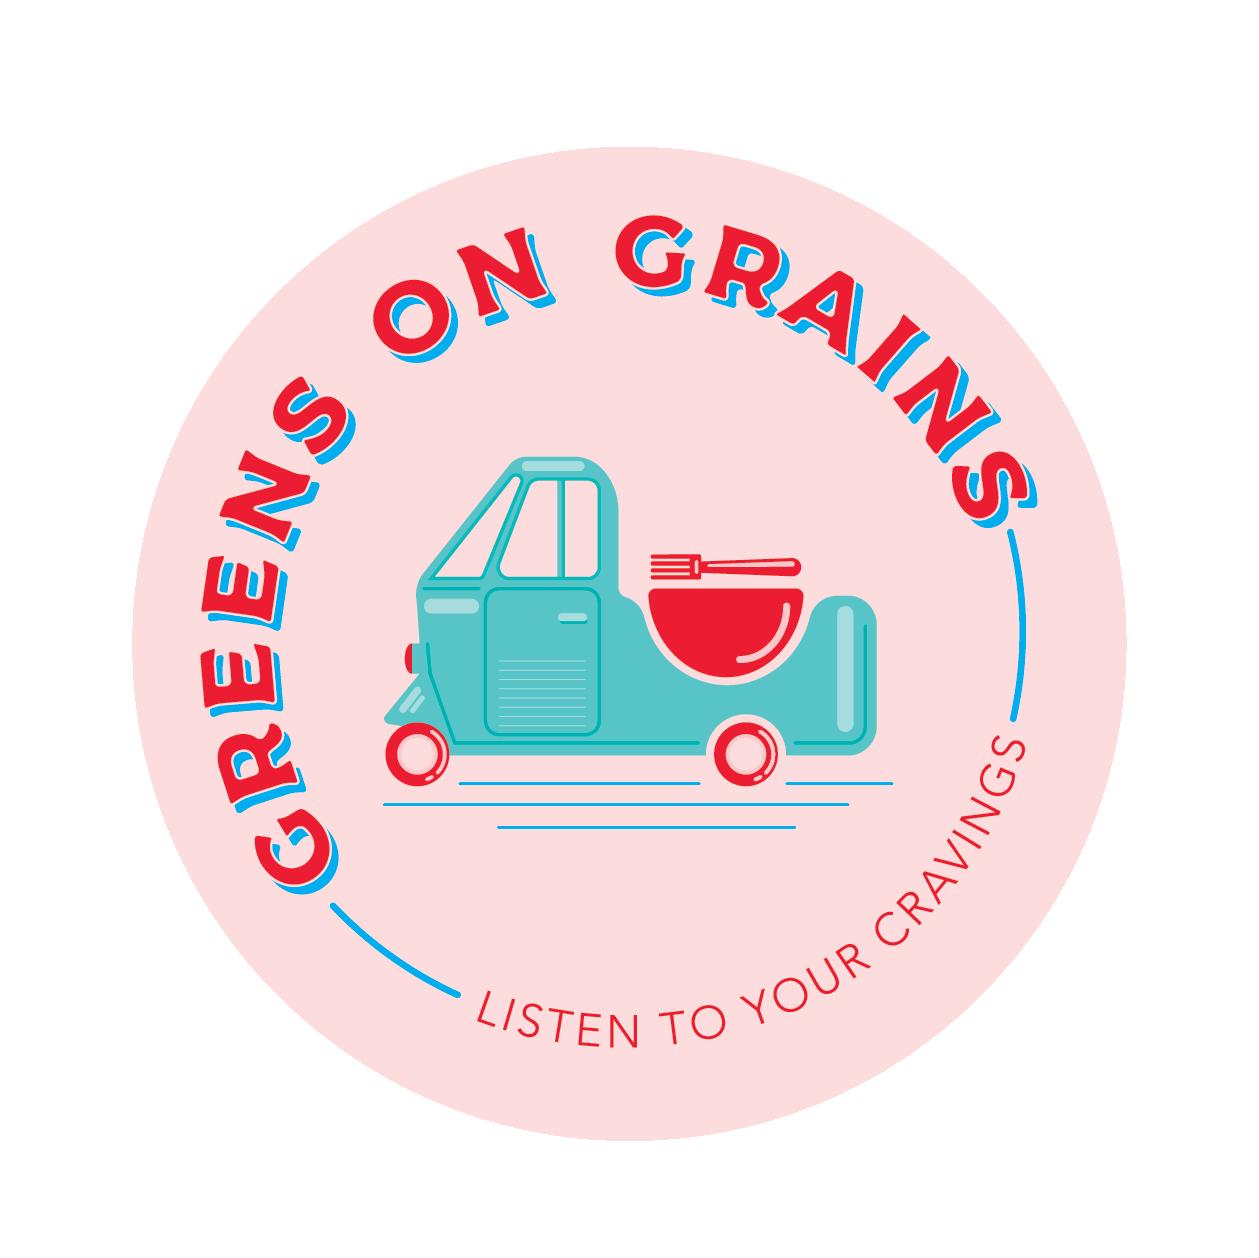 Grains clipart grain truck. Modern colorful logo design